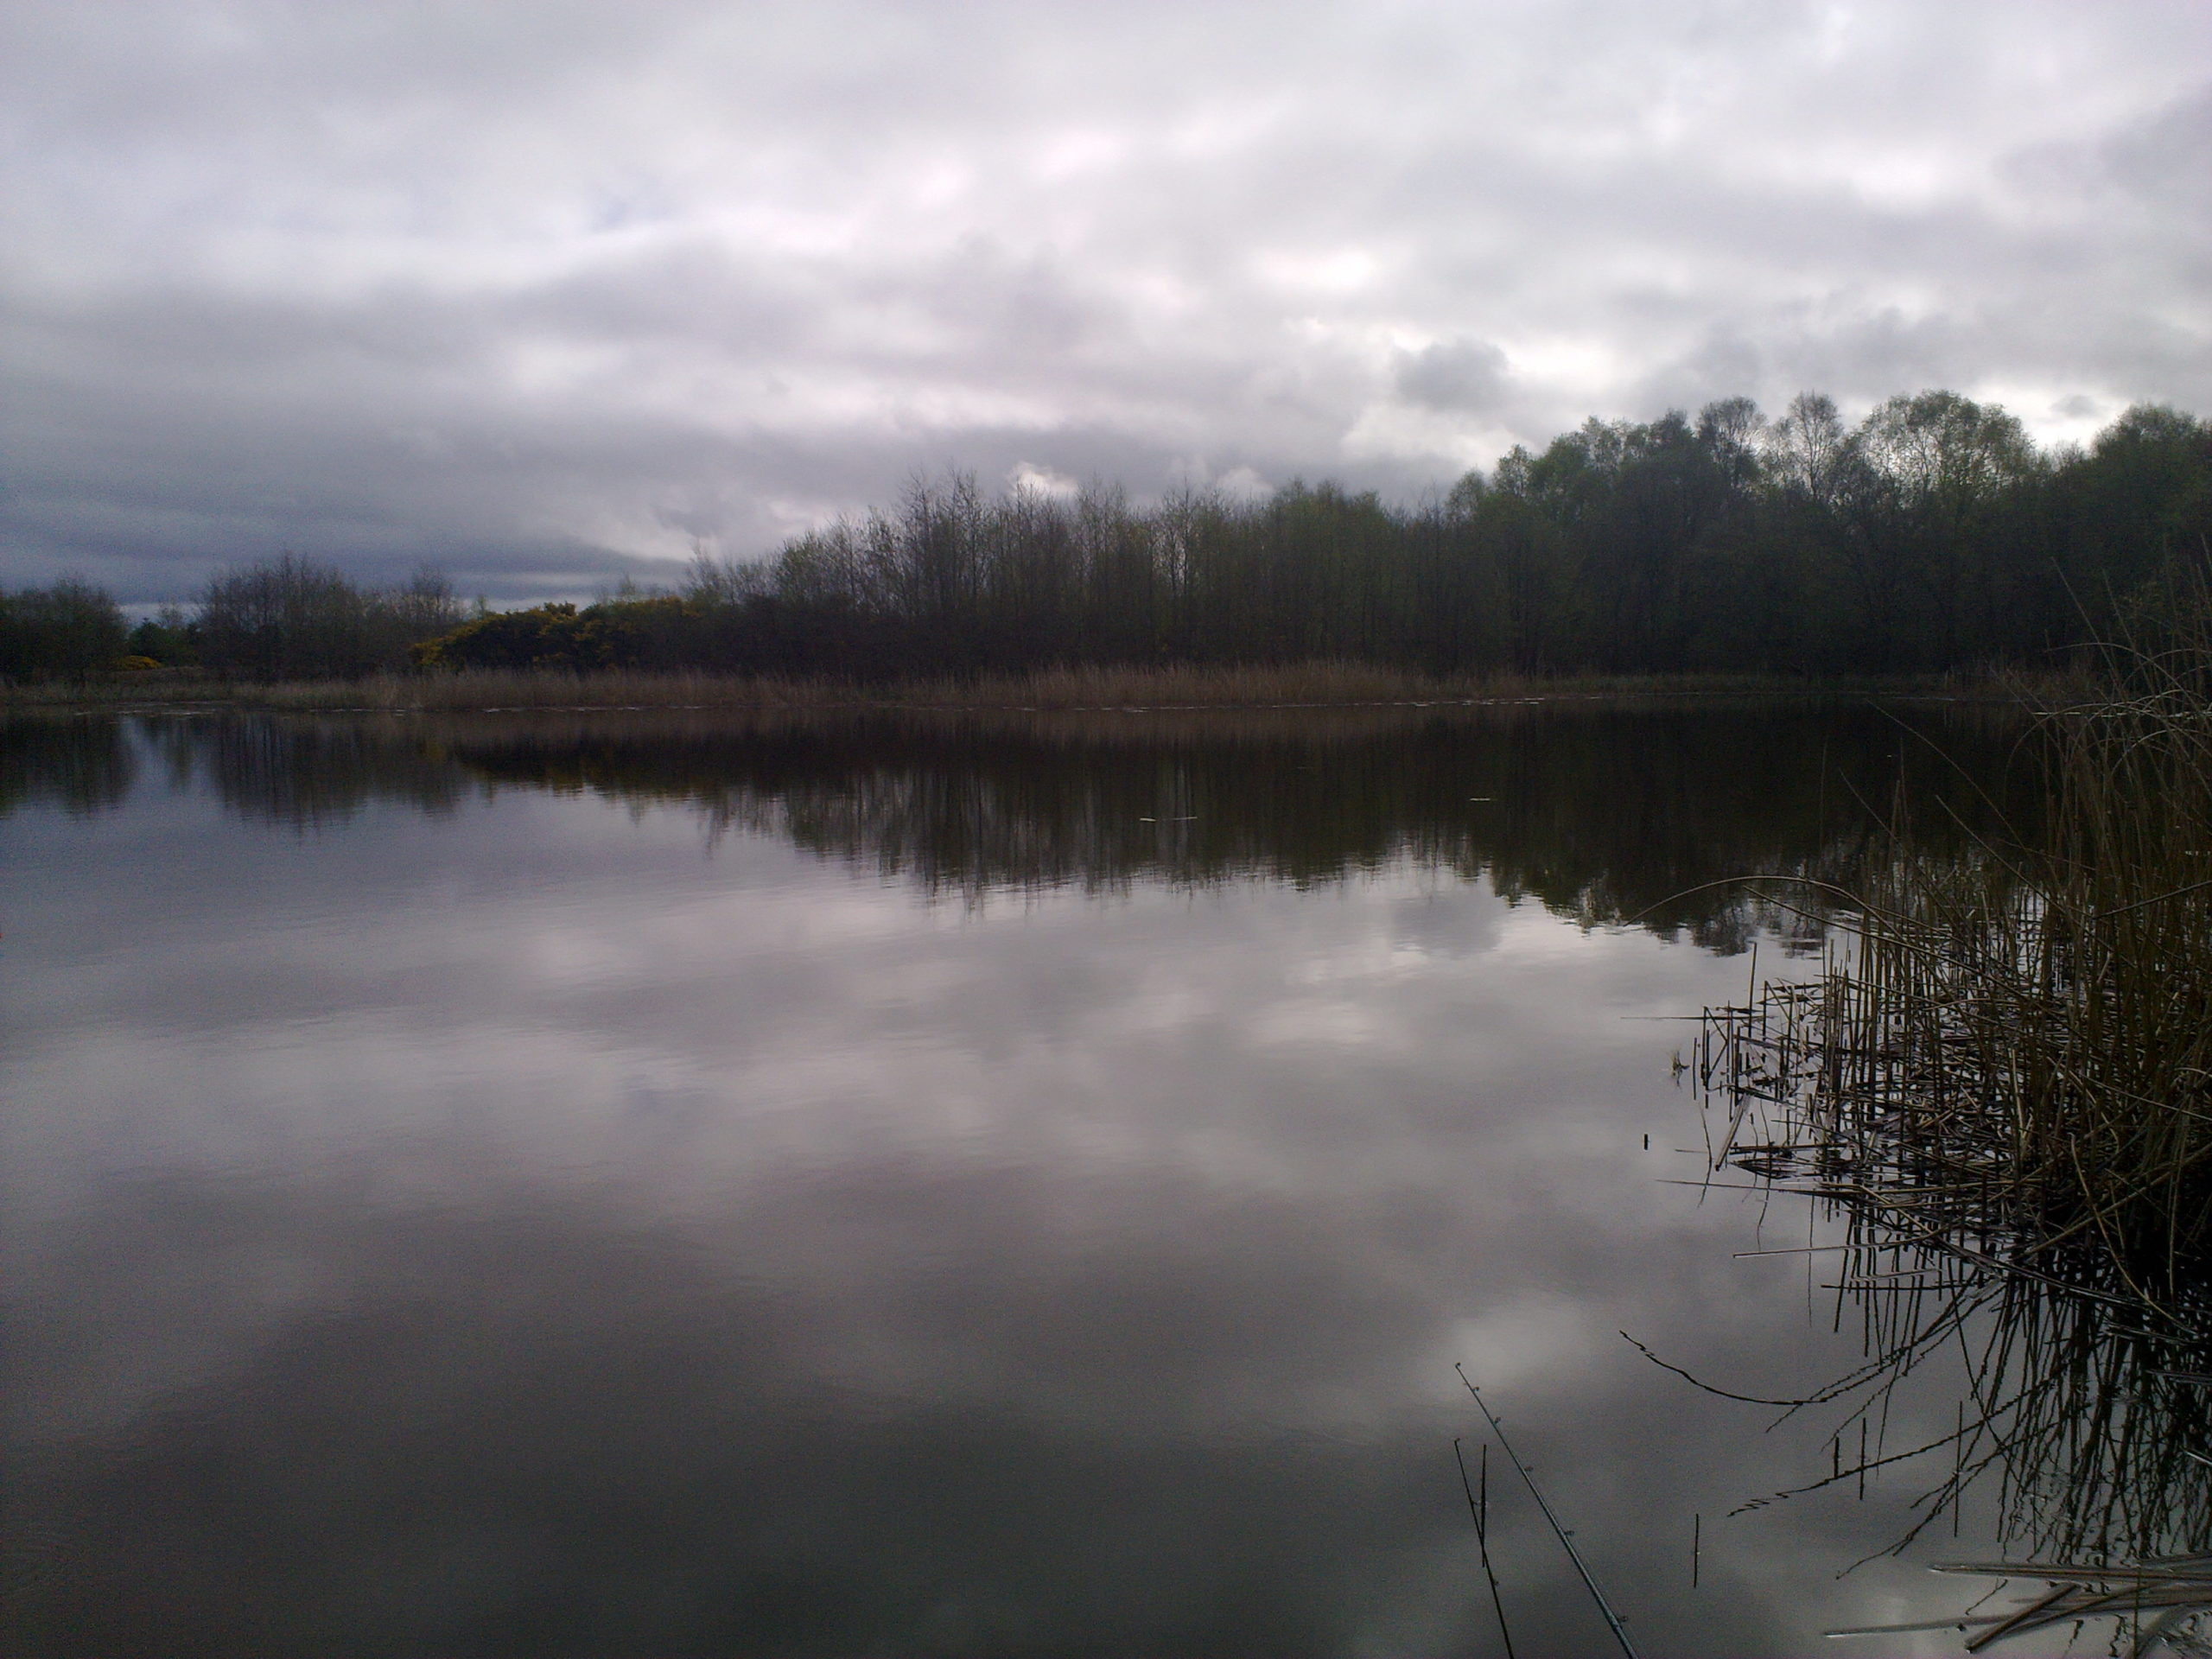 Ballaghmore Lake